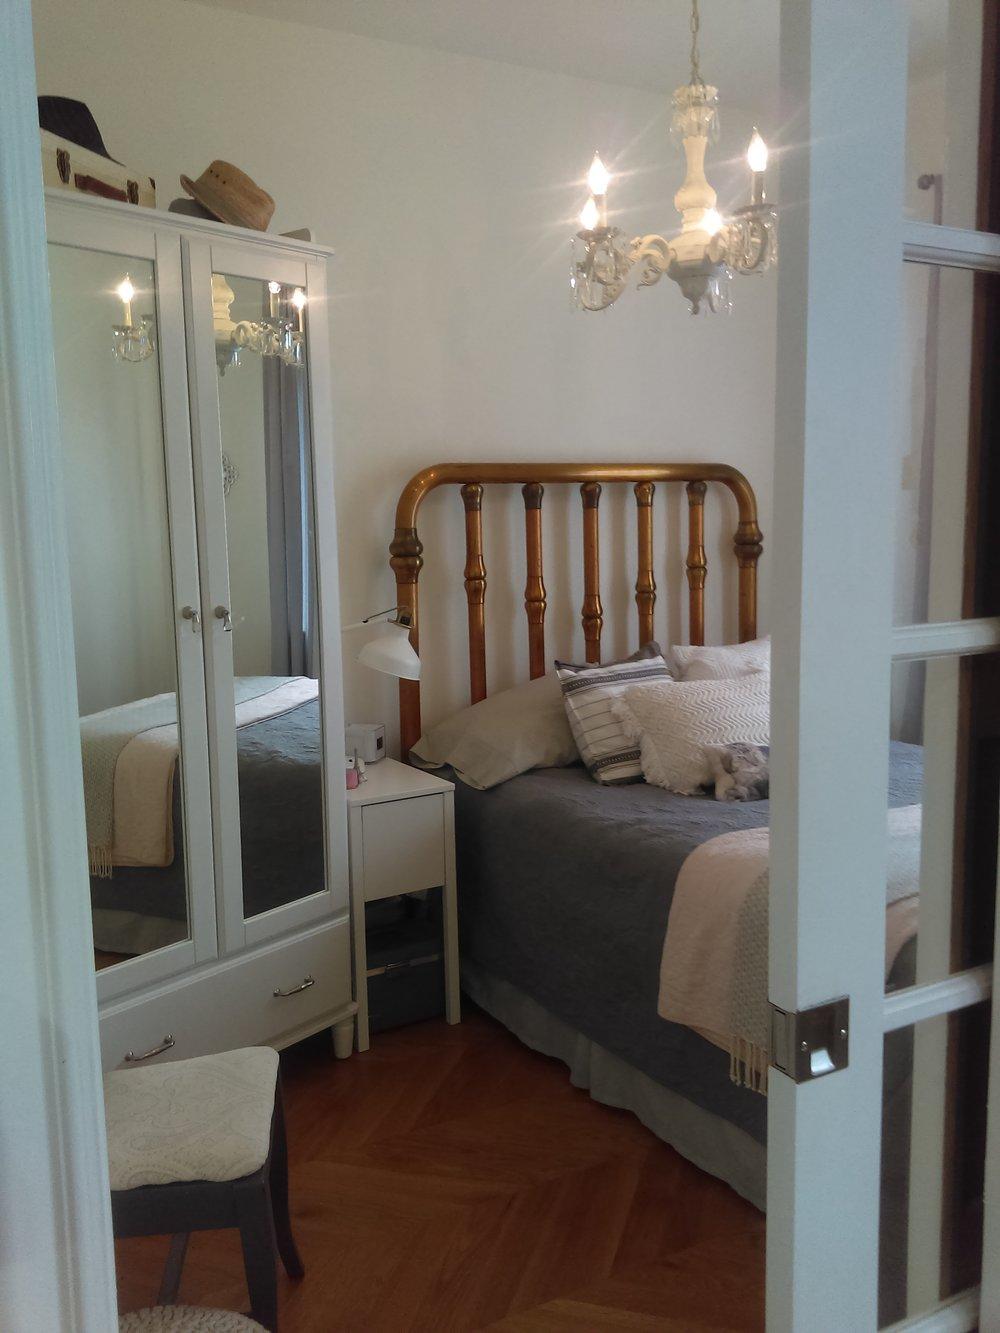 1 Bedroom.jpg